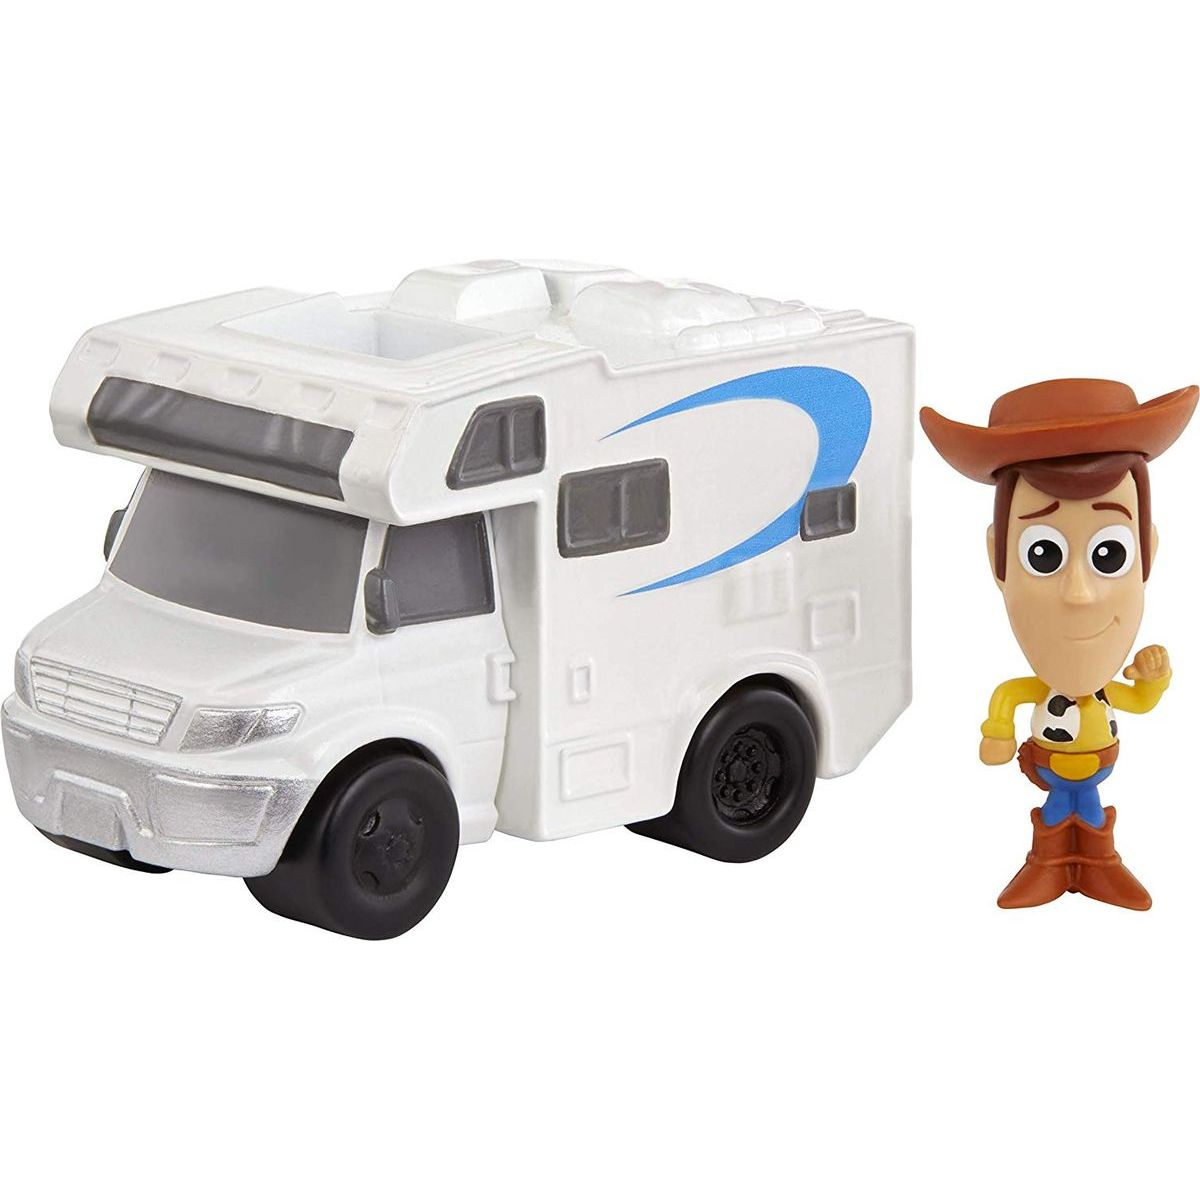 Mattel Toy story 4 minifigurka s vozidlem Woody a RV